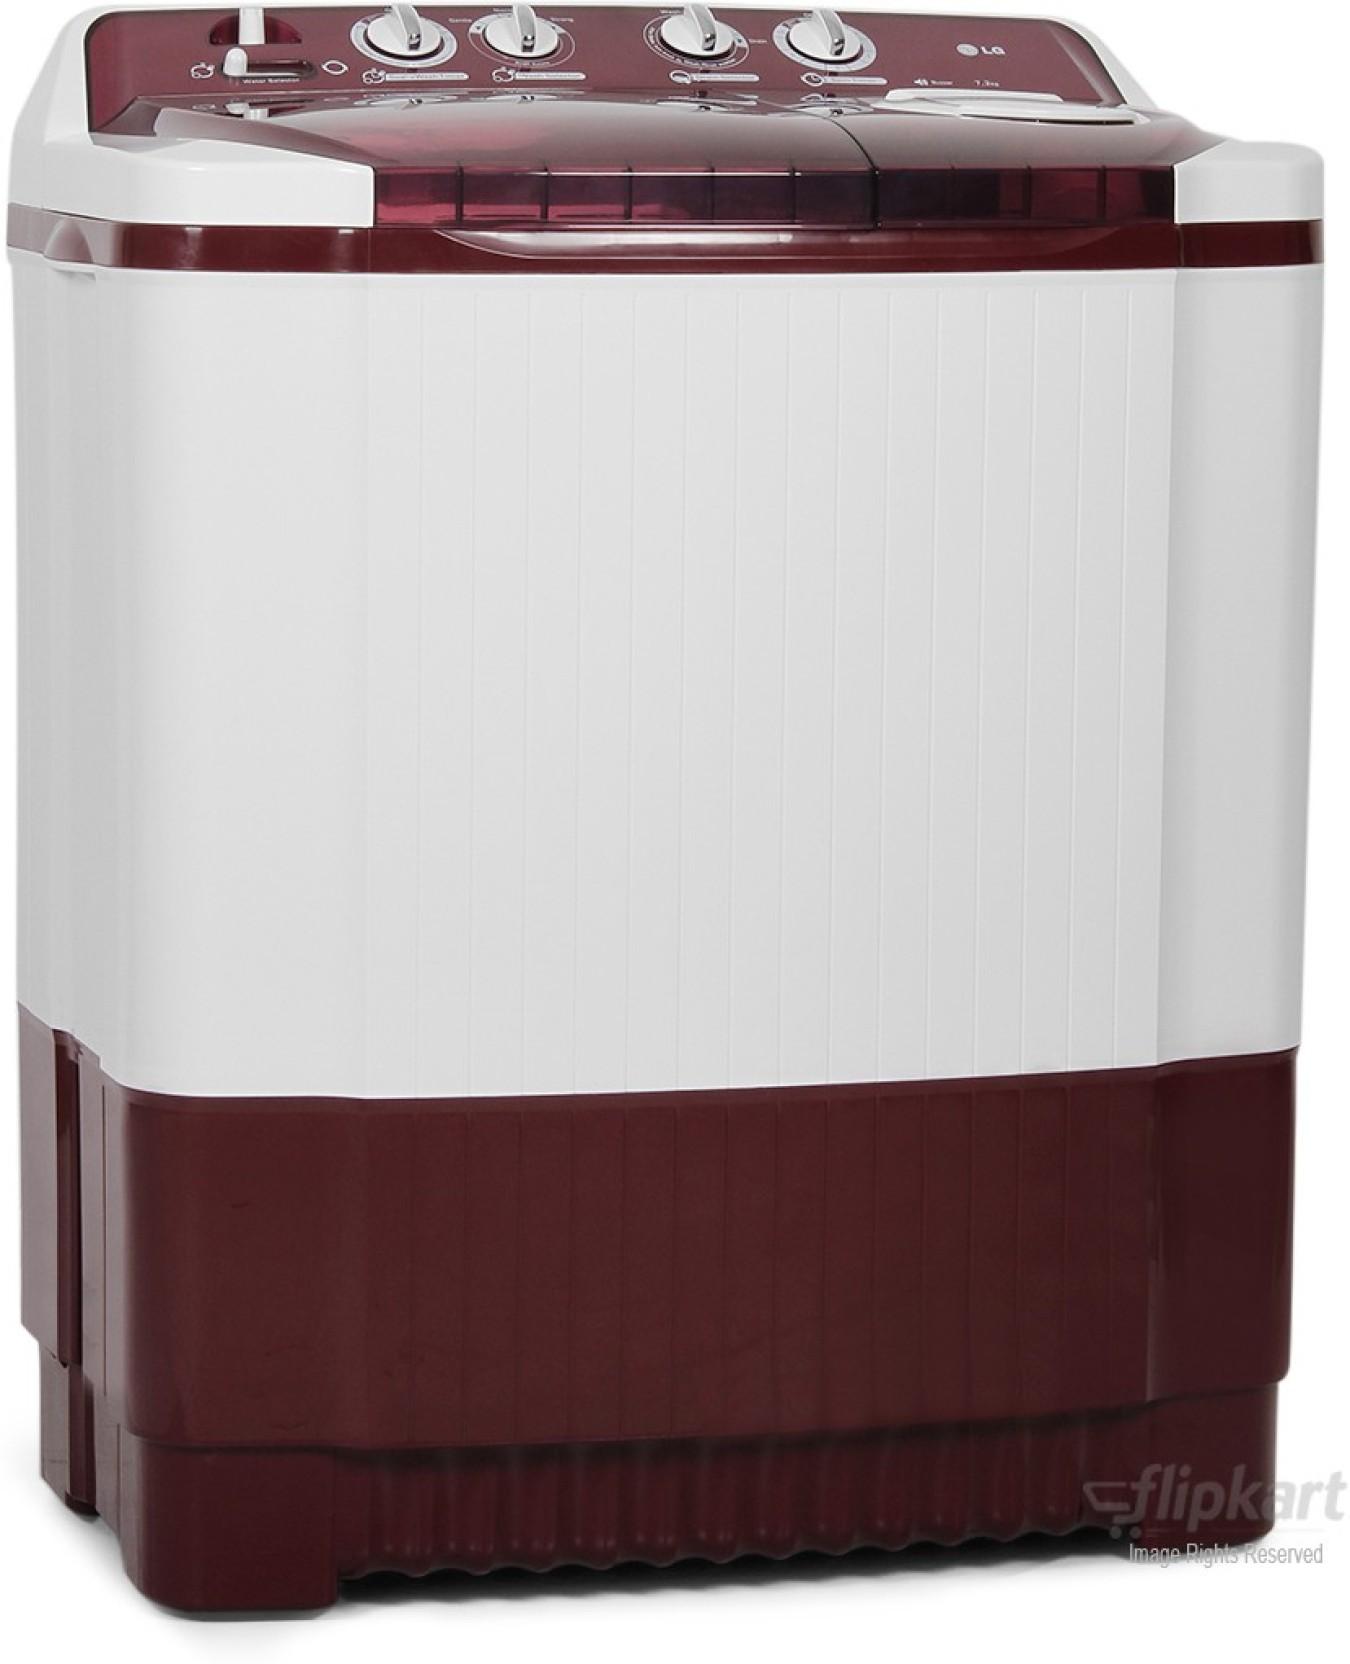 LG 7.2 kg Semi Automatic Top Load Washing Machine Red ...